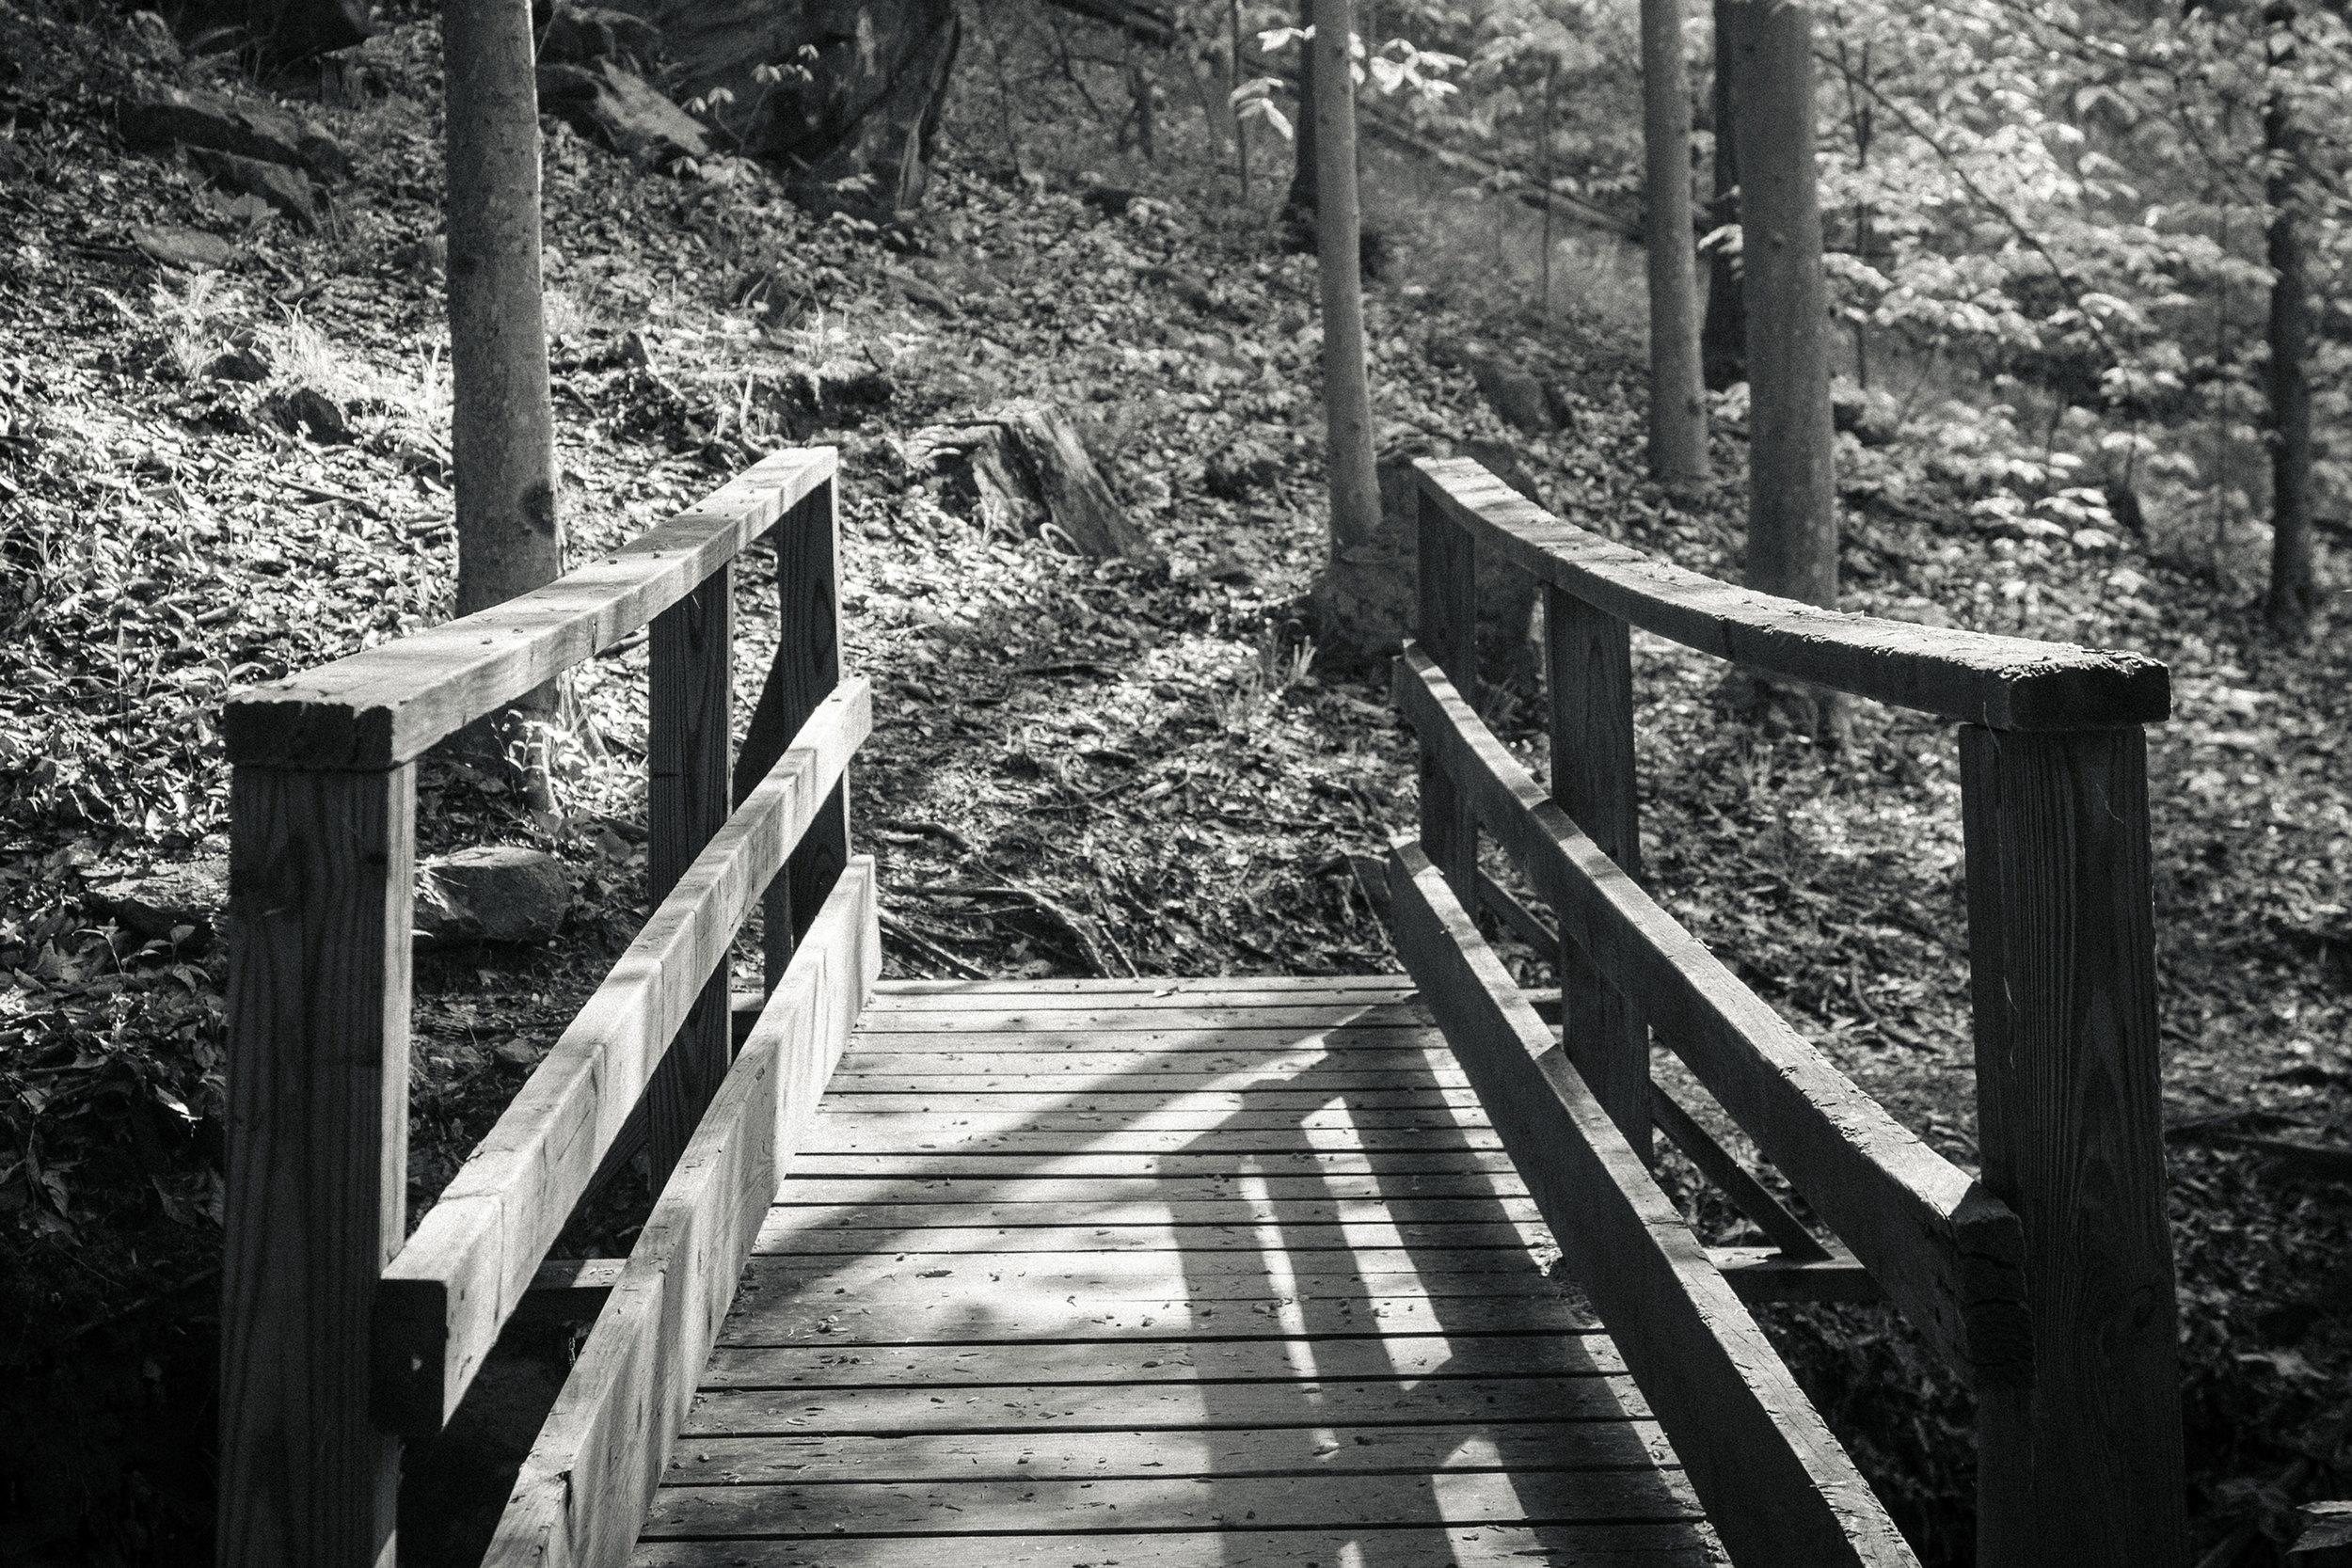 Prince-William-Forest.jpg